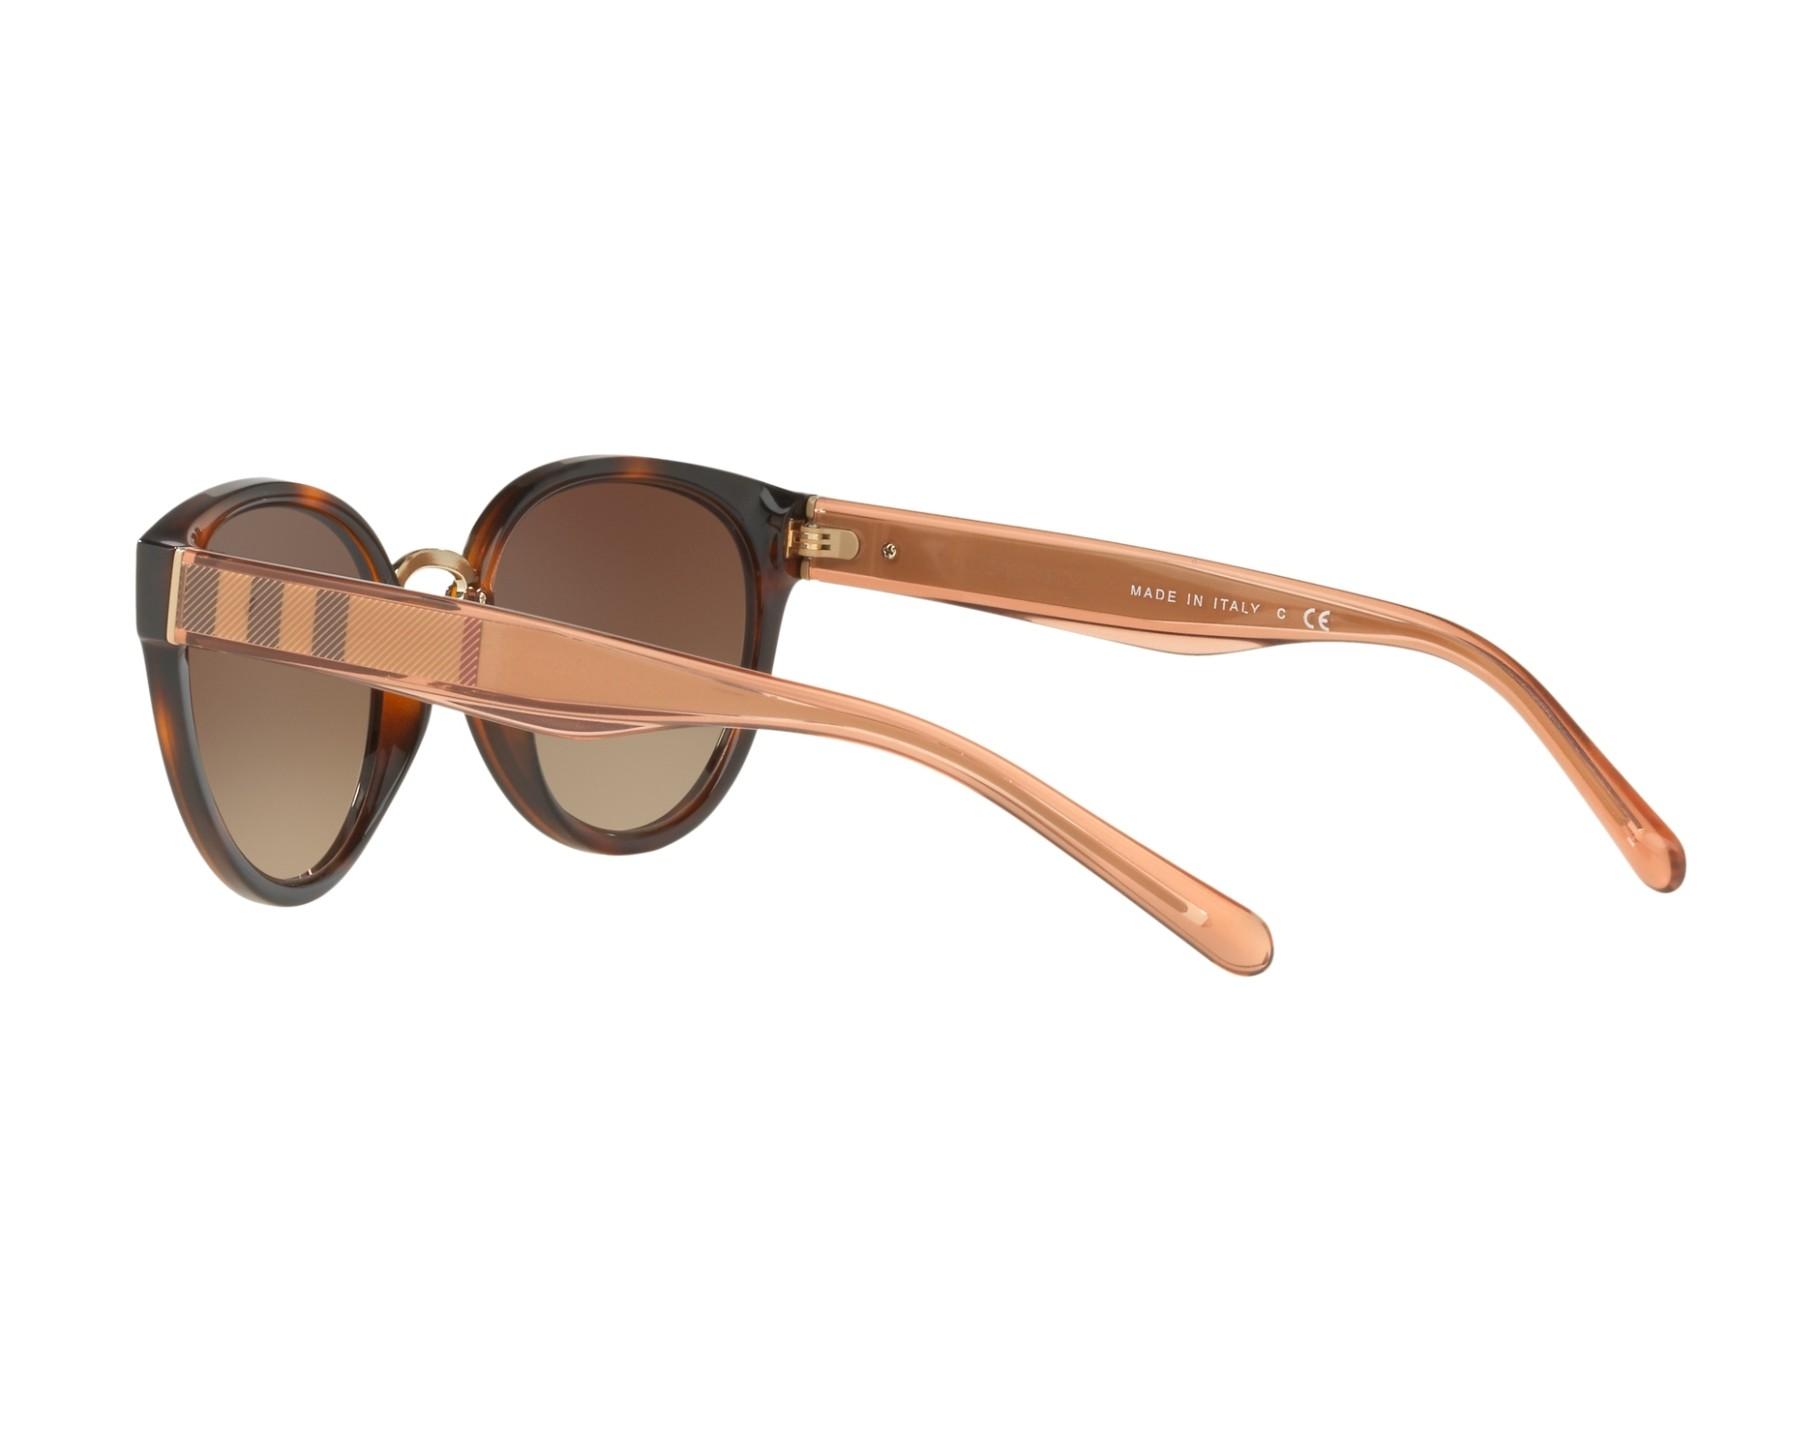 7495c43b569 Sunglasses Burberry BE-4249 331613 - Havana Beige 360 degree view 5